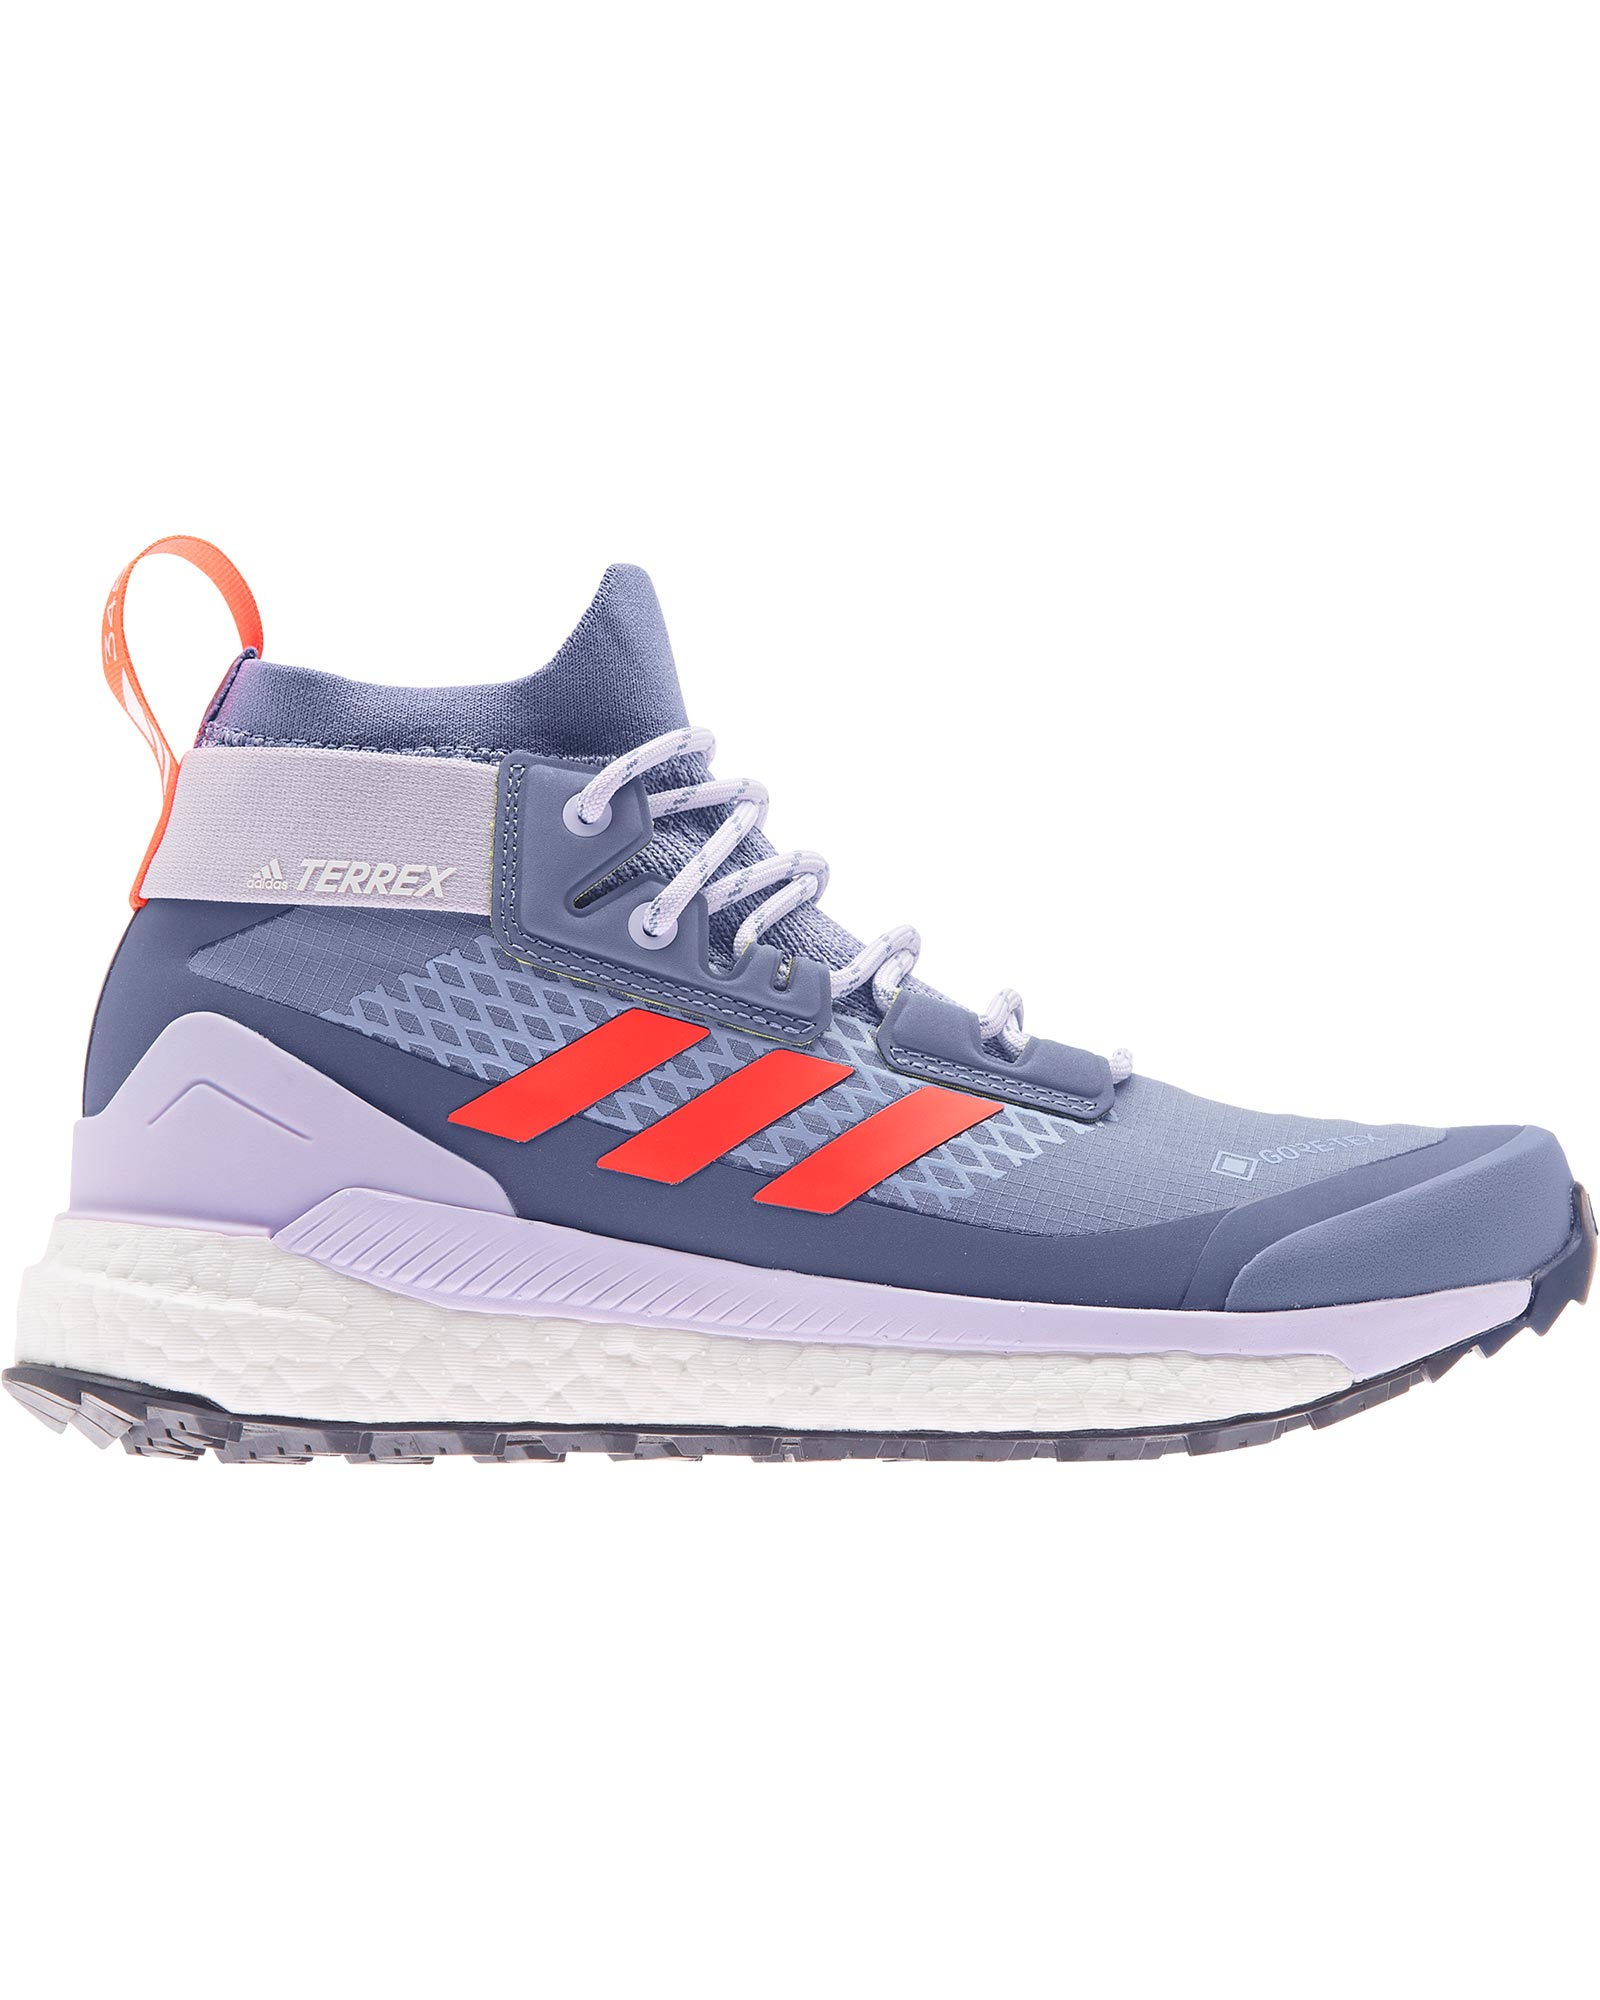 Adidas Terrex Free Hiker GORE-TEX Women's Boots 0